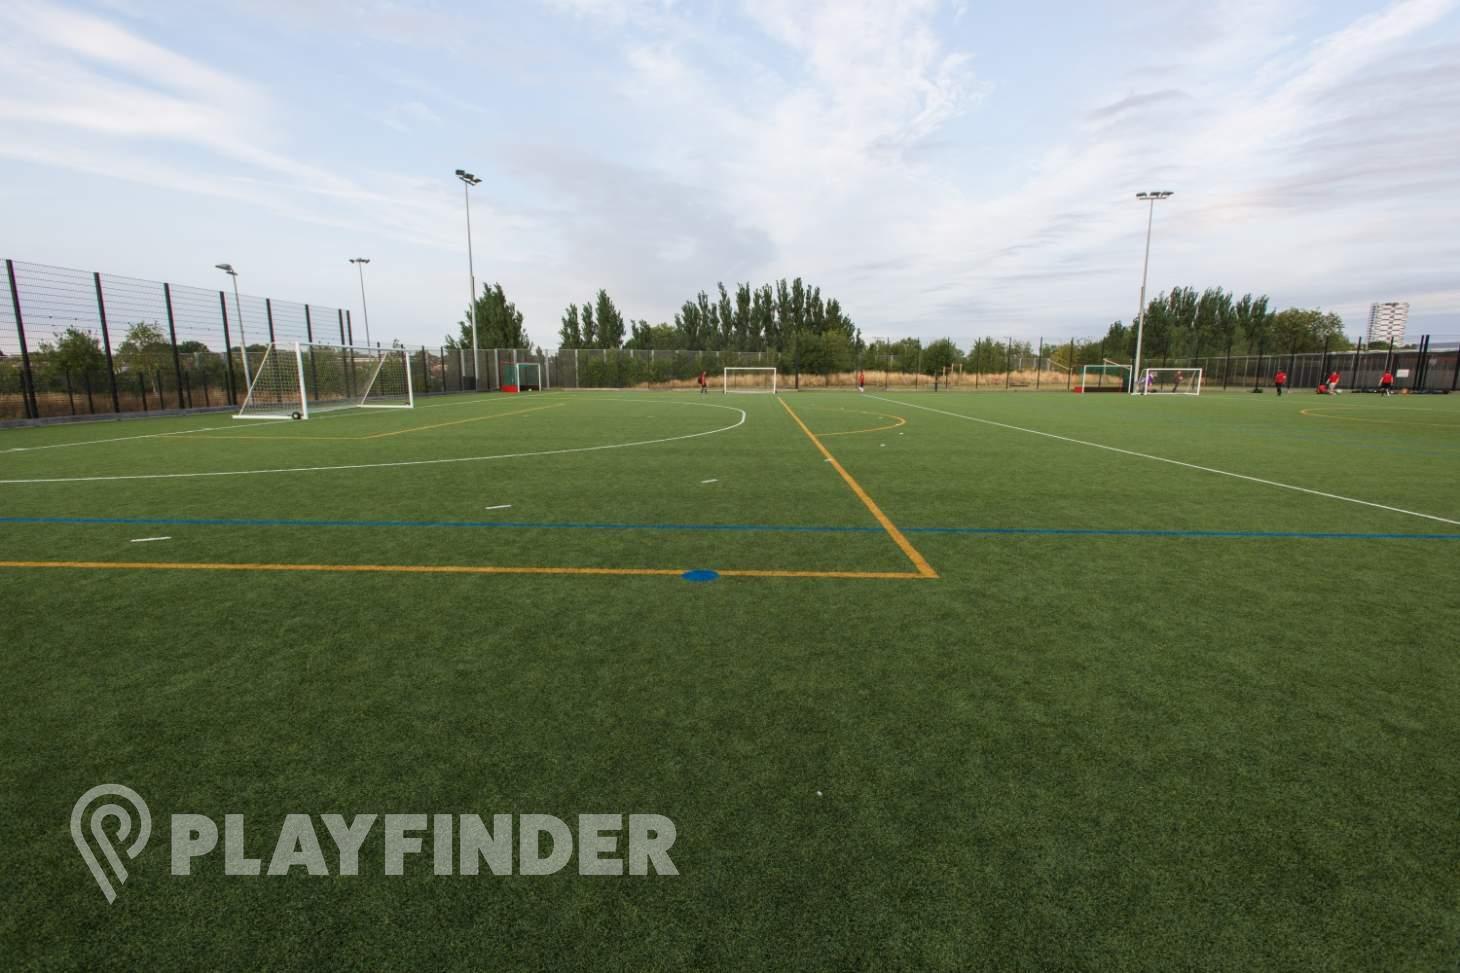 Stratford International Astroturf 7 a side | 3G Astroturf football pitch